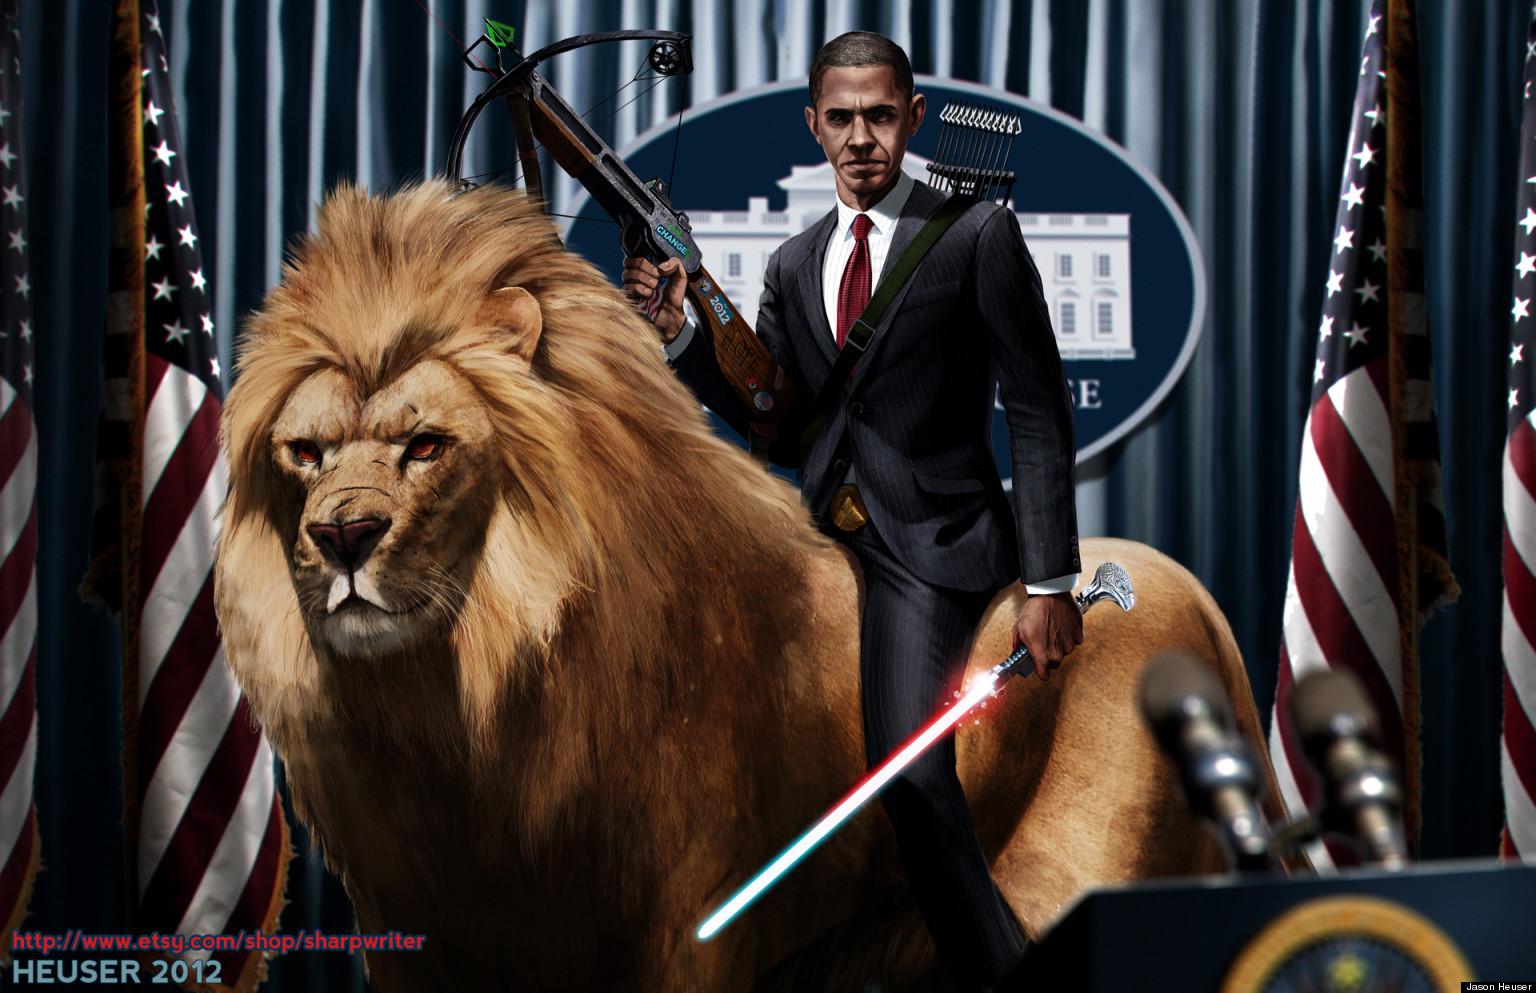 Beautiful Wallpaper Lion Facebook - o-OBAMA_RIDING_A_LION_BY_SHARPWRITERD5FTZE6-facebook  Image_477316.jpg